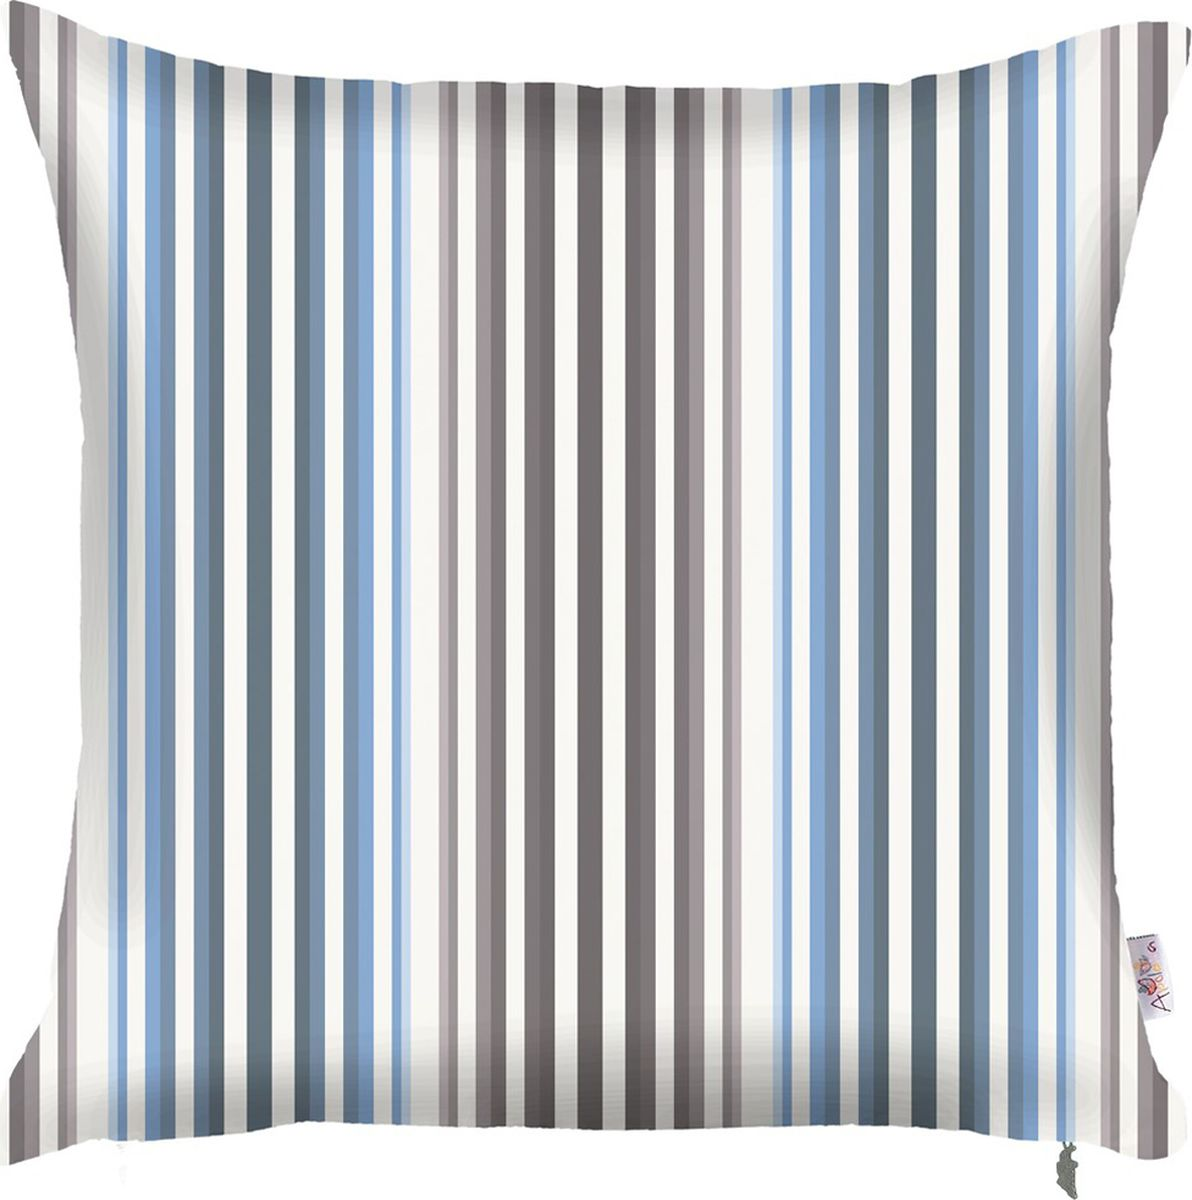 Чехол для декоративной подушки Apolena Blue collection, 43 х 43 см. P702-7910/1P702-7910/1